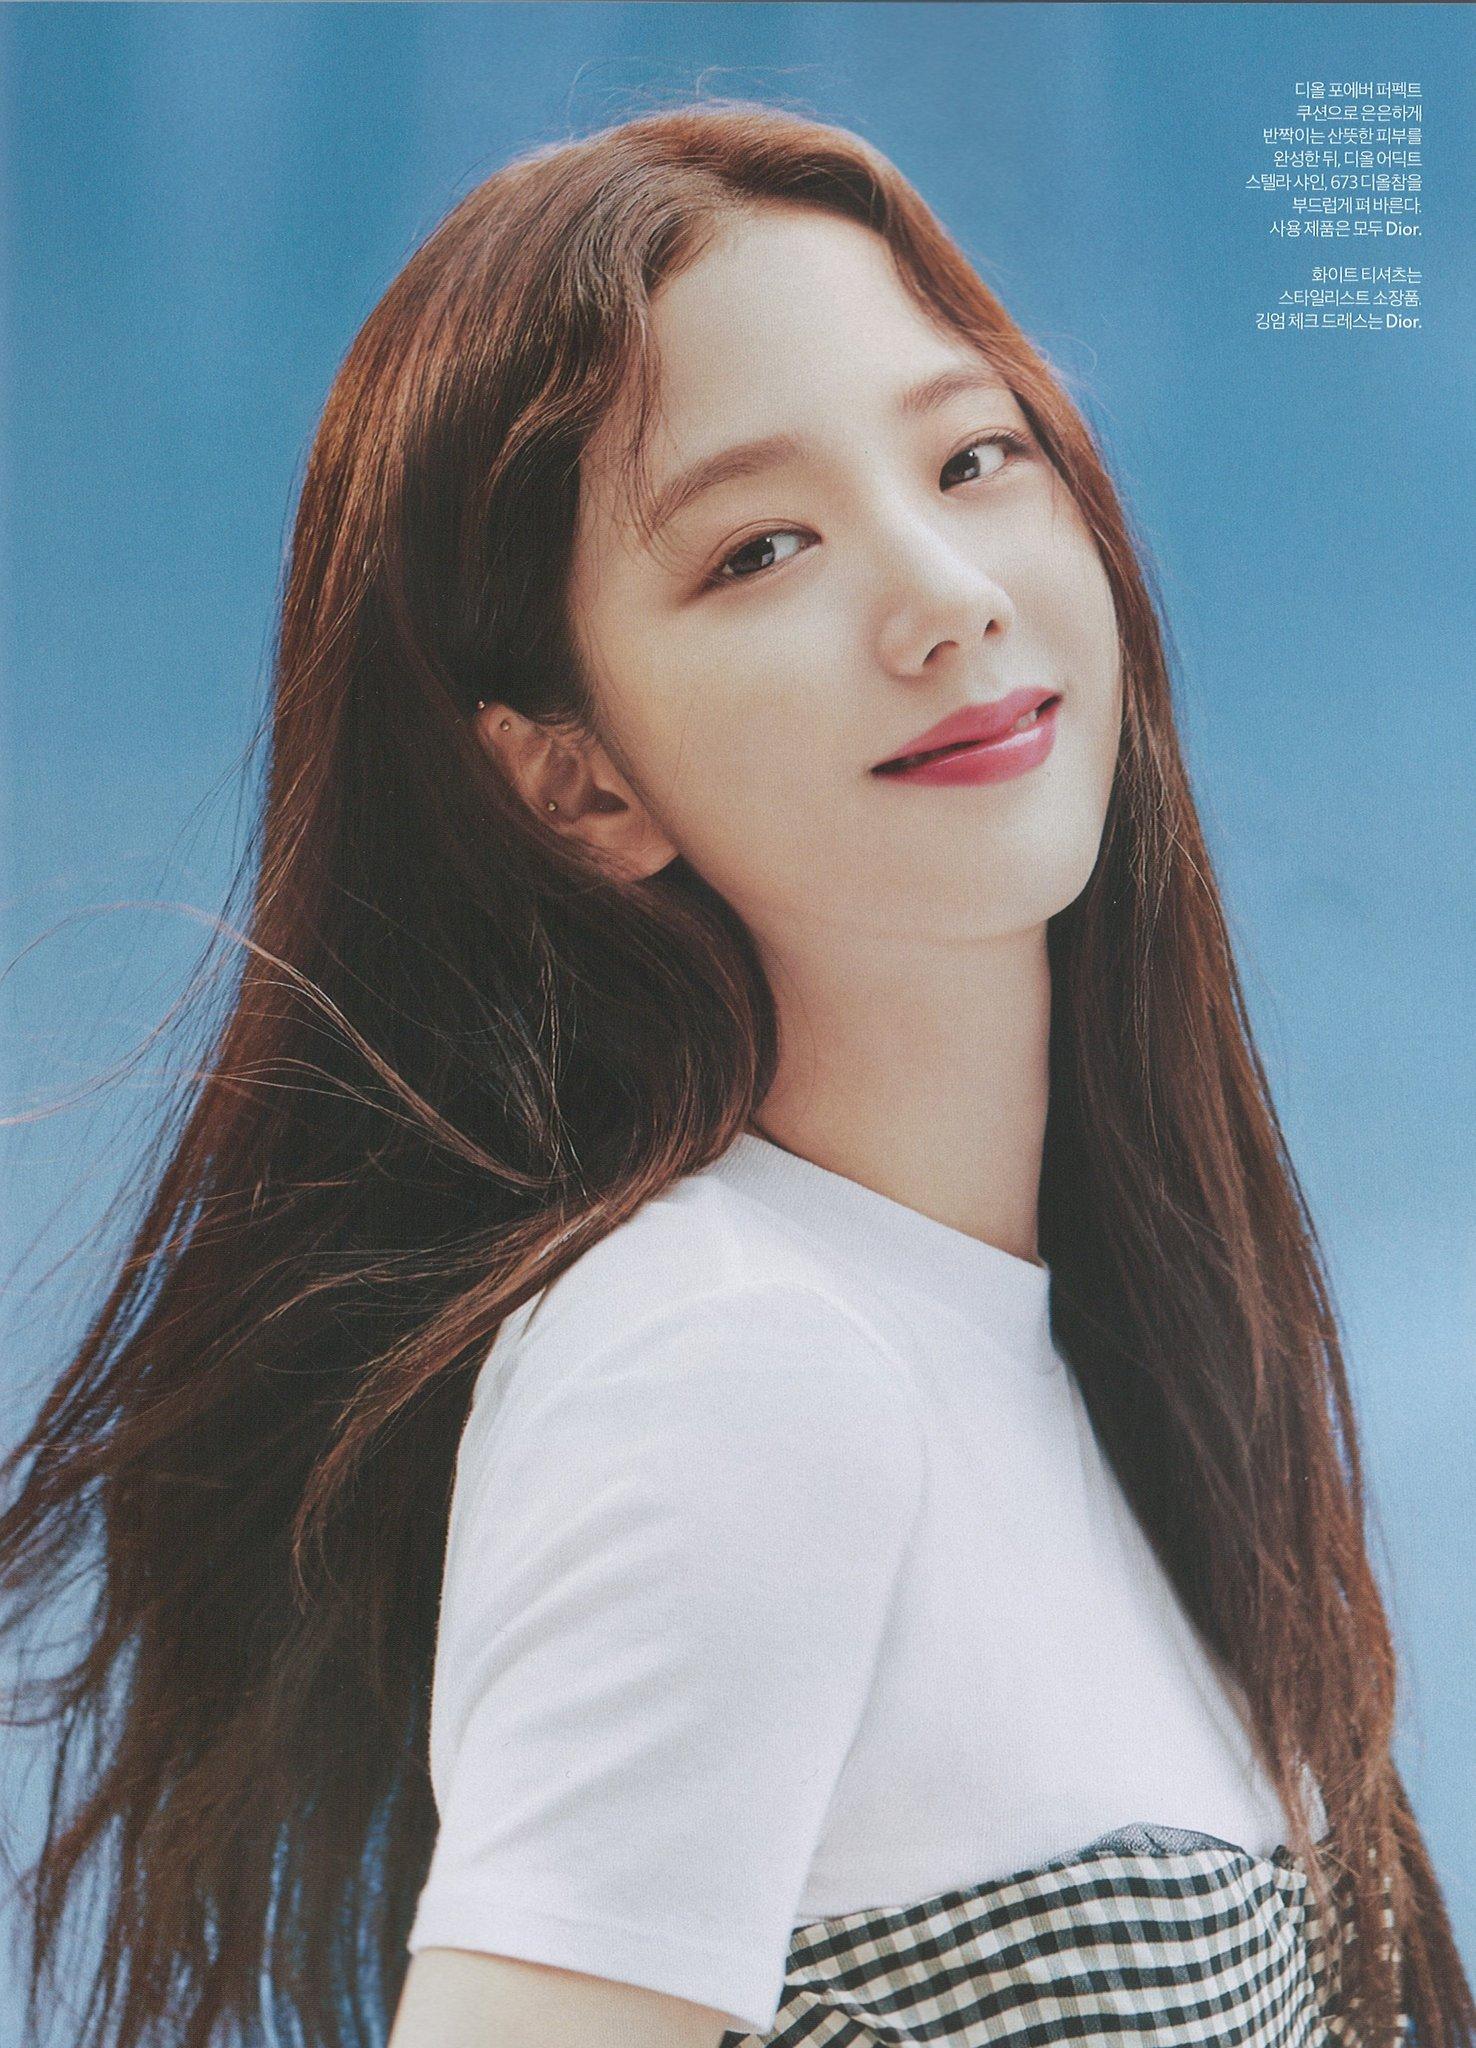 Blackpink Jisoo X Dior For Elle Korea July 2020 Issue